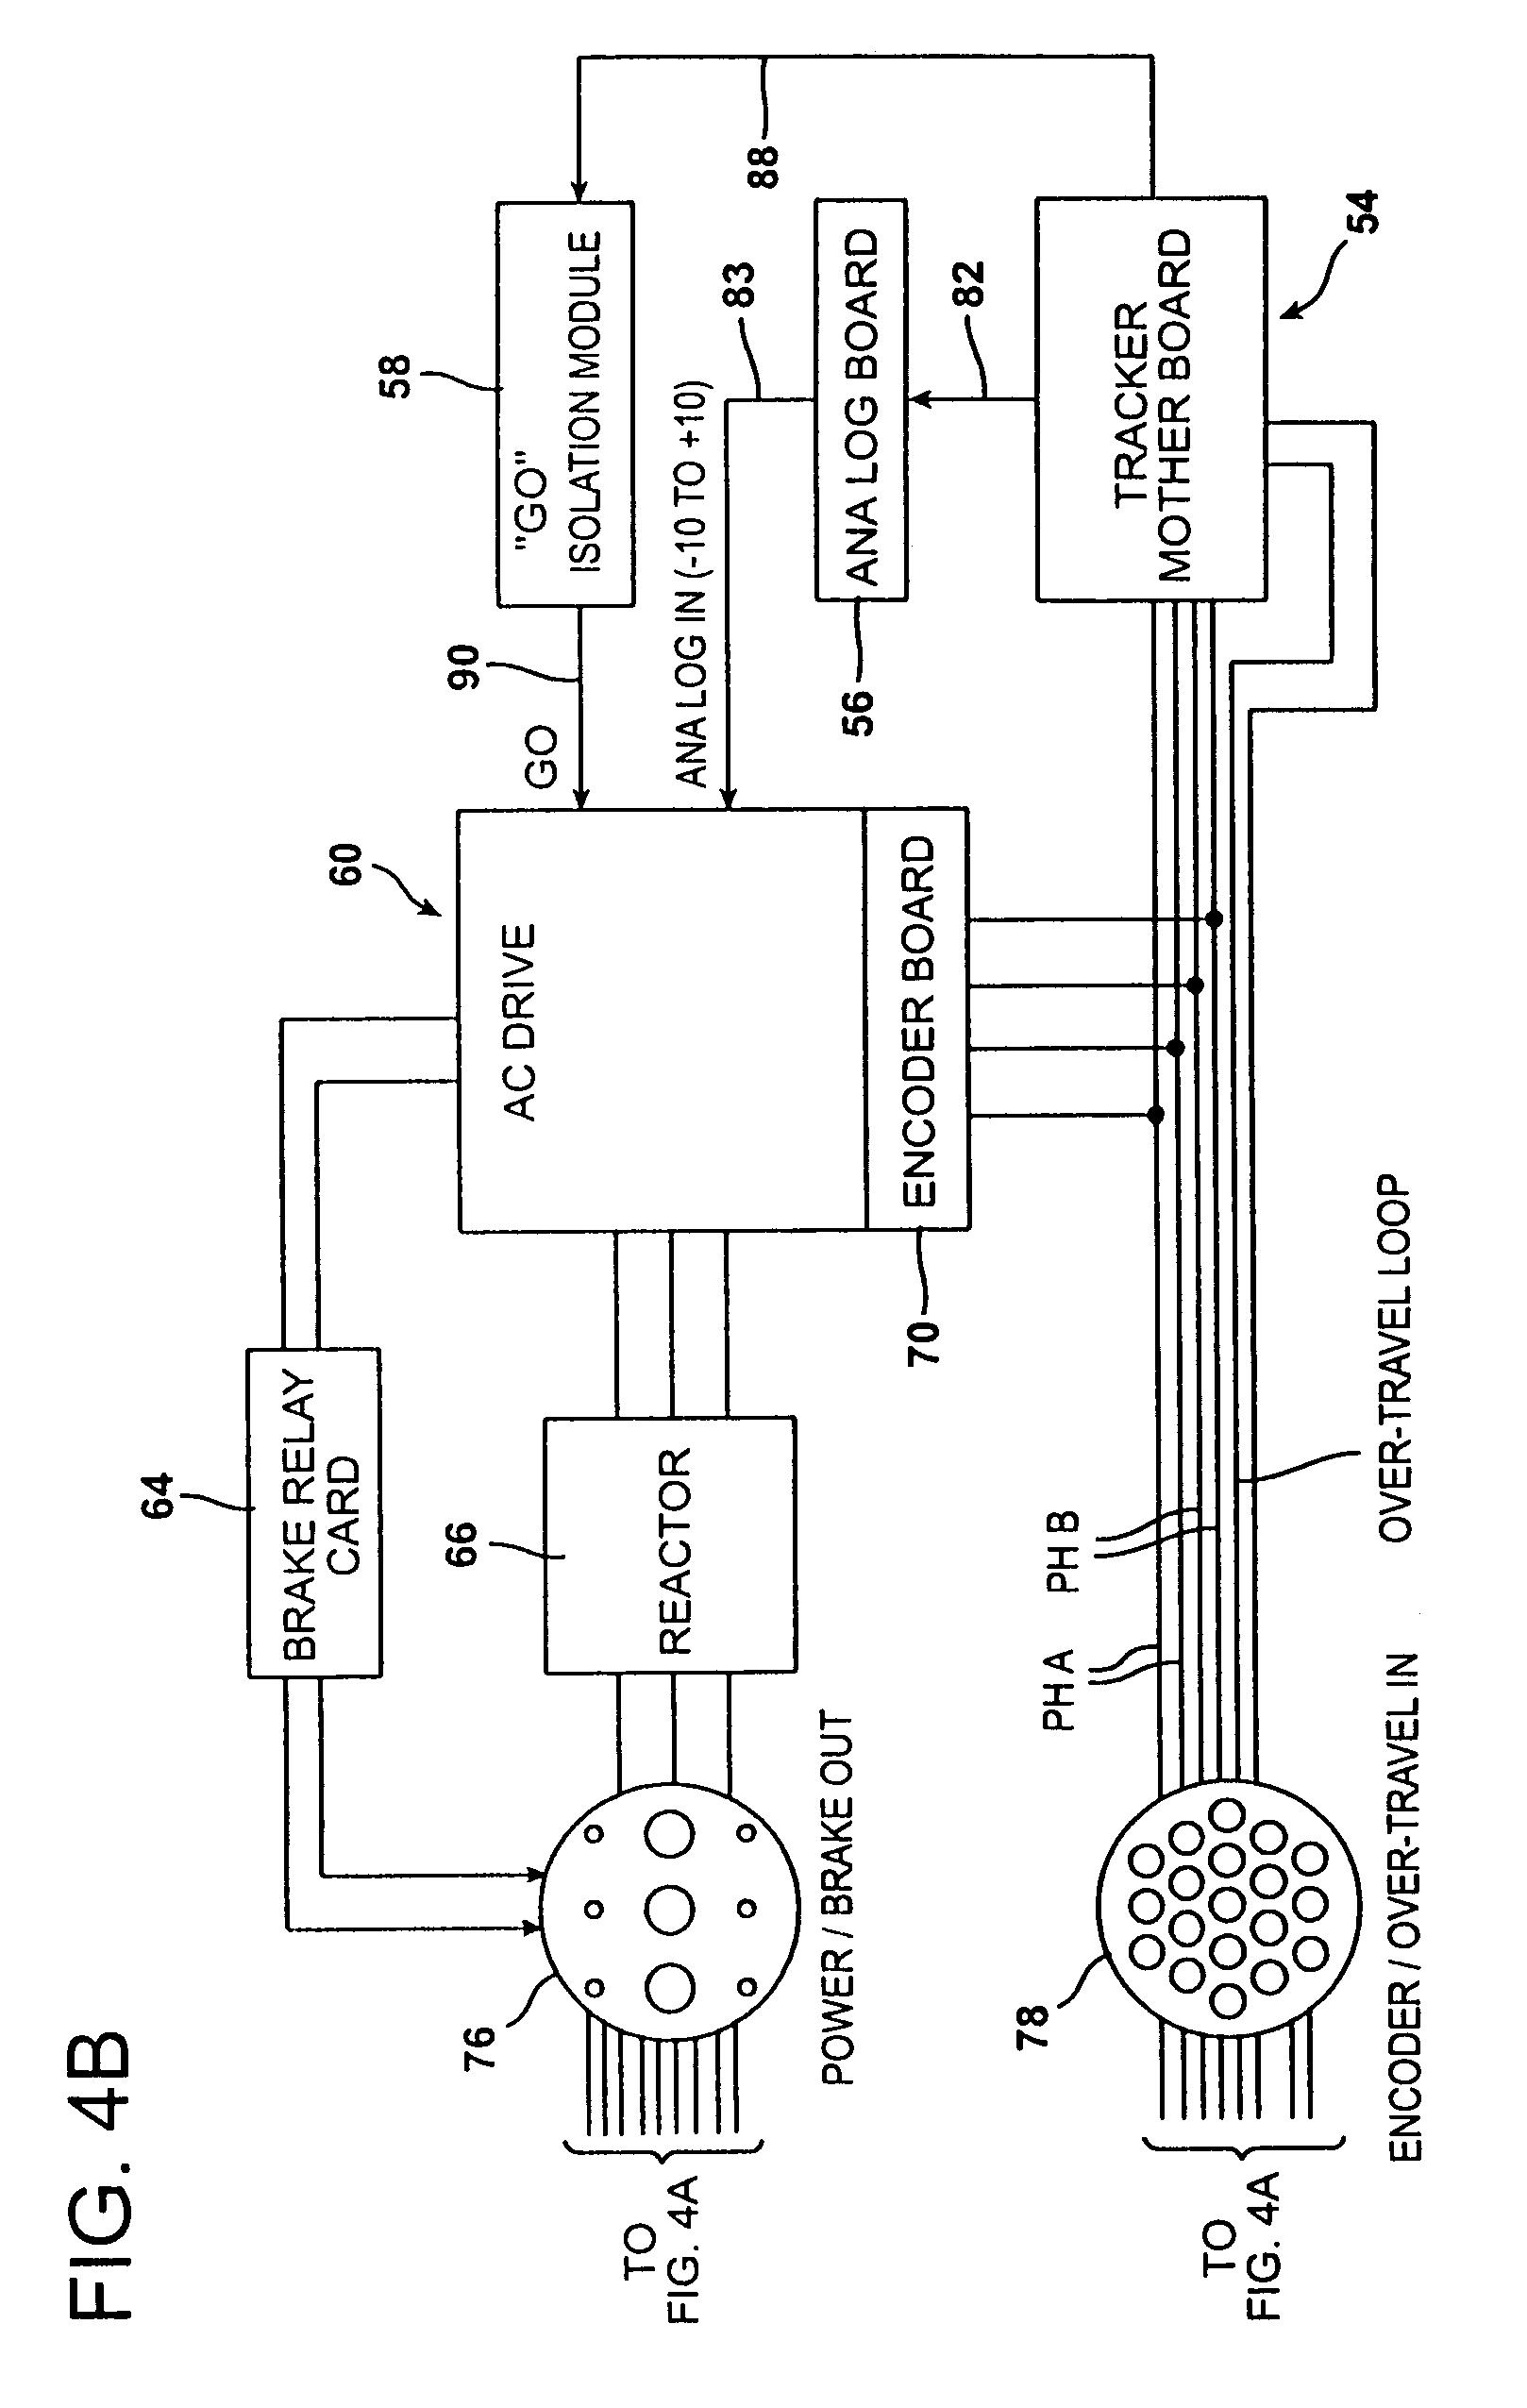 hight resolution of 1 ton cm hoist wiring diagram data wiring diagram cm hoist pendant wiring diagram 1 ton